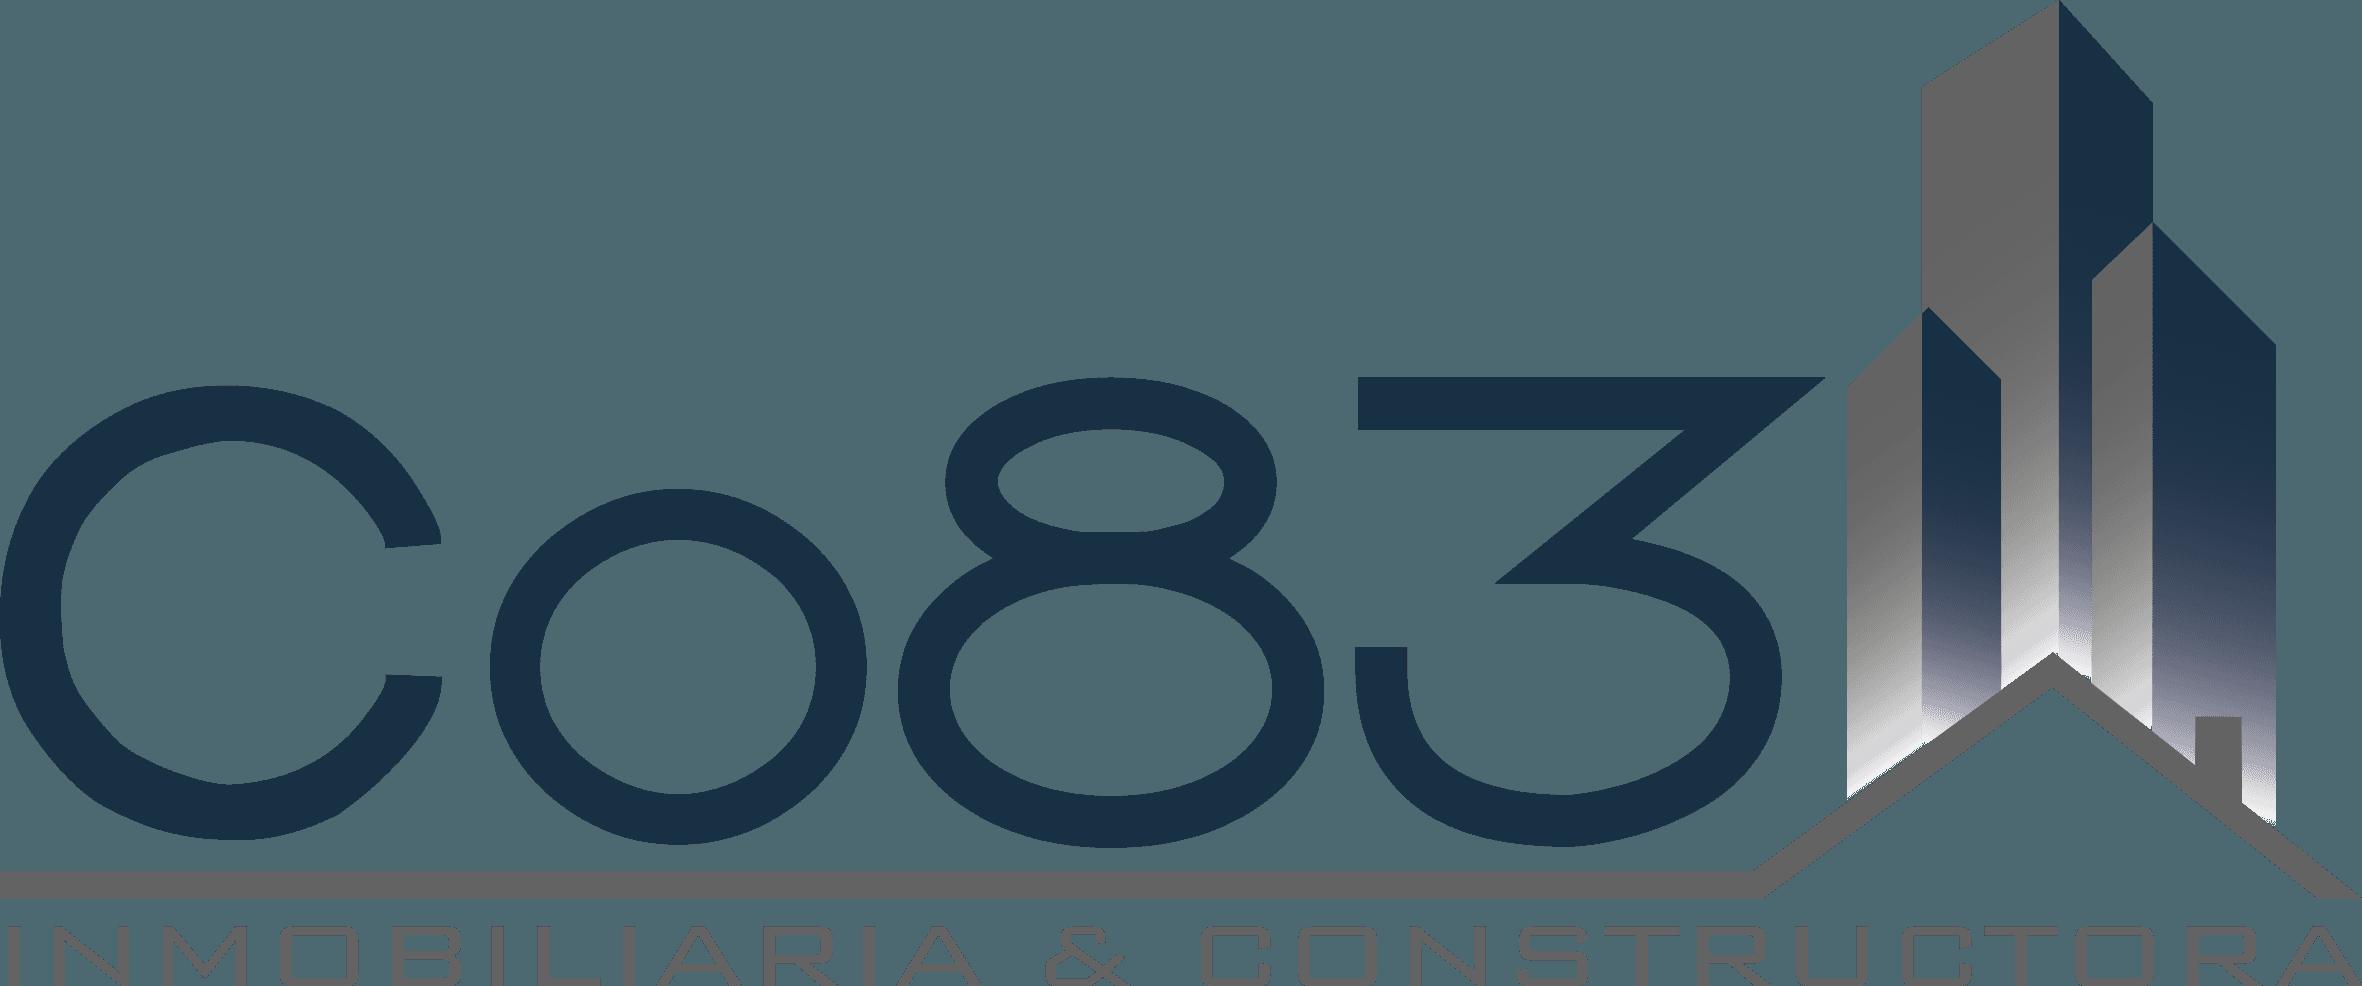 Logo de  Co83 Inmobiliaria & Constructora